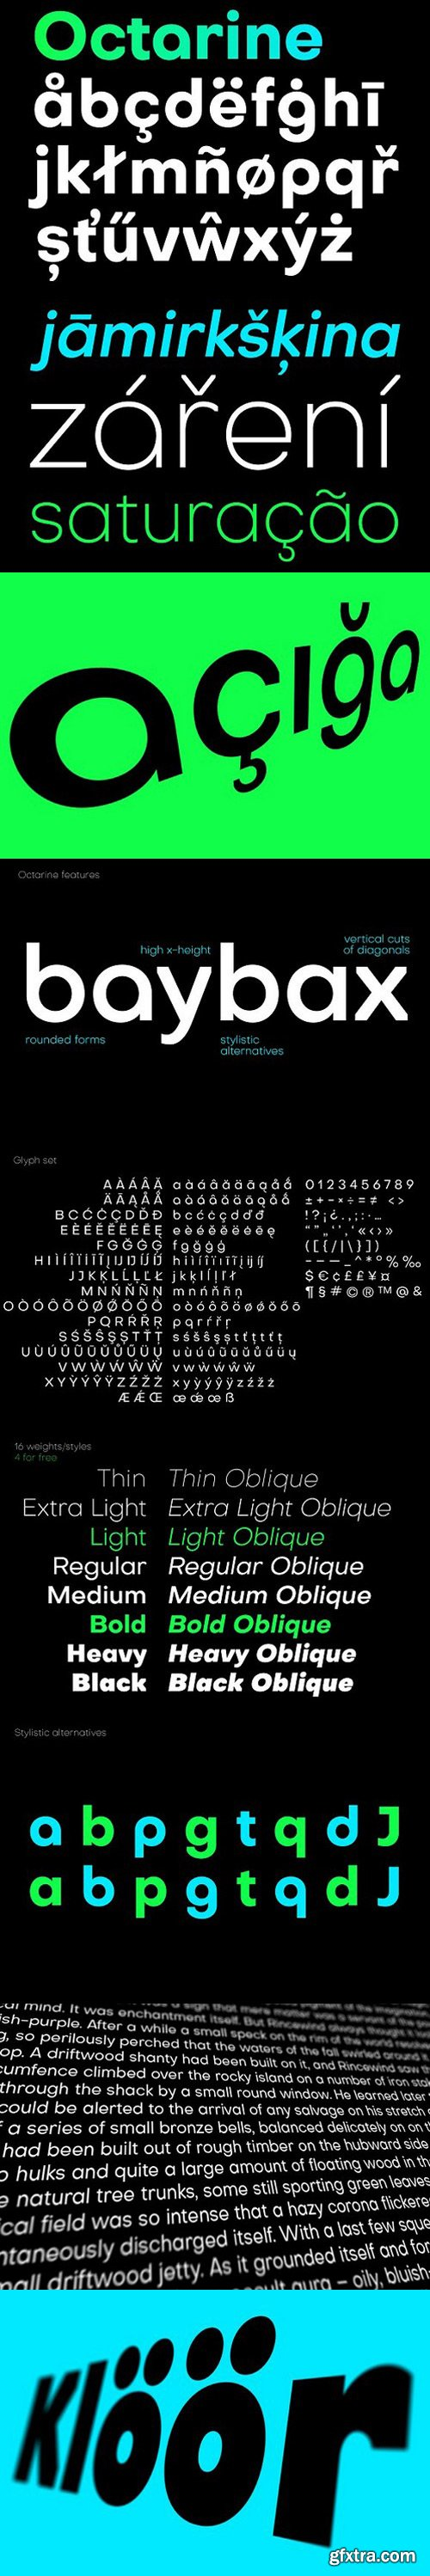 Octarine 16 fonts